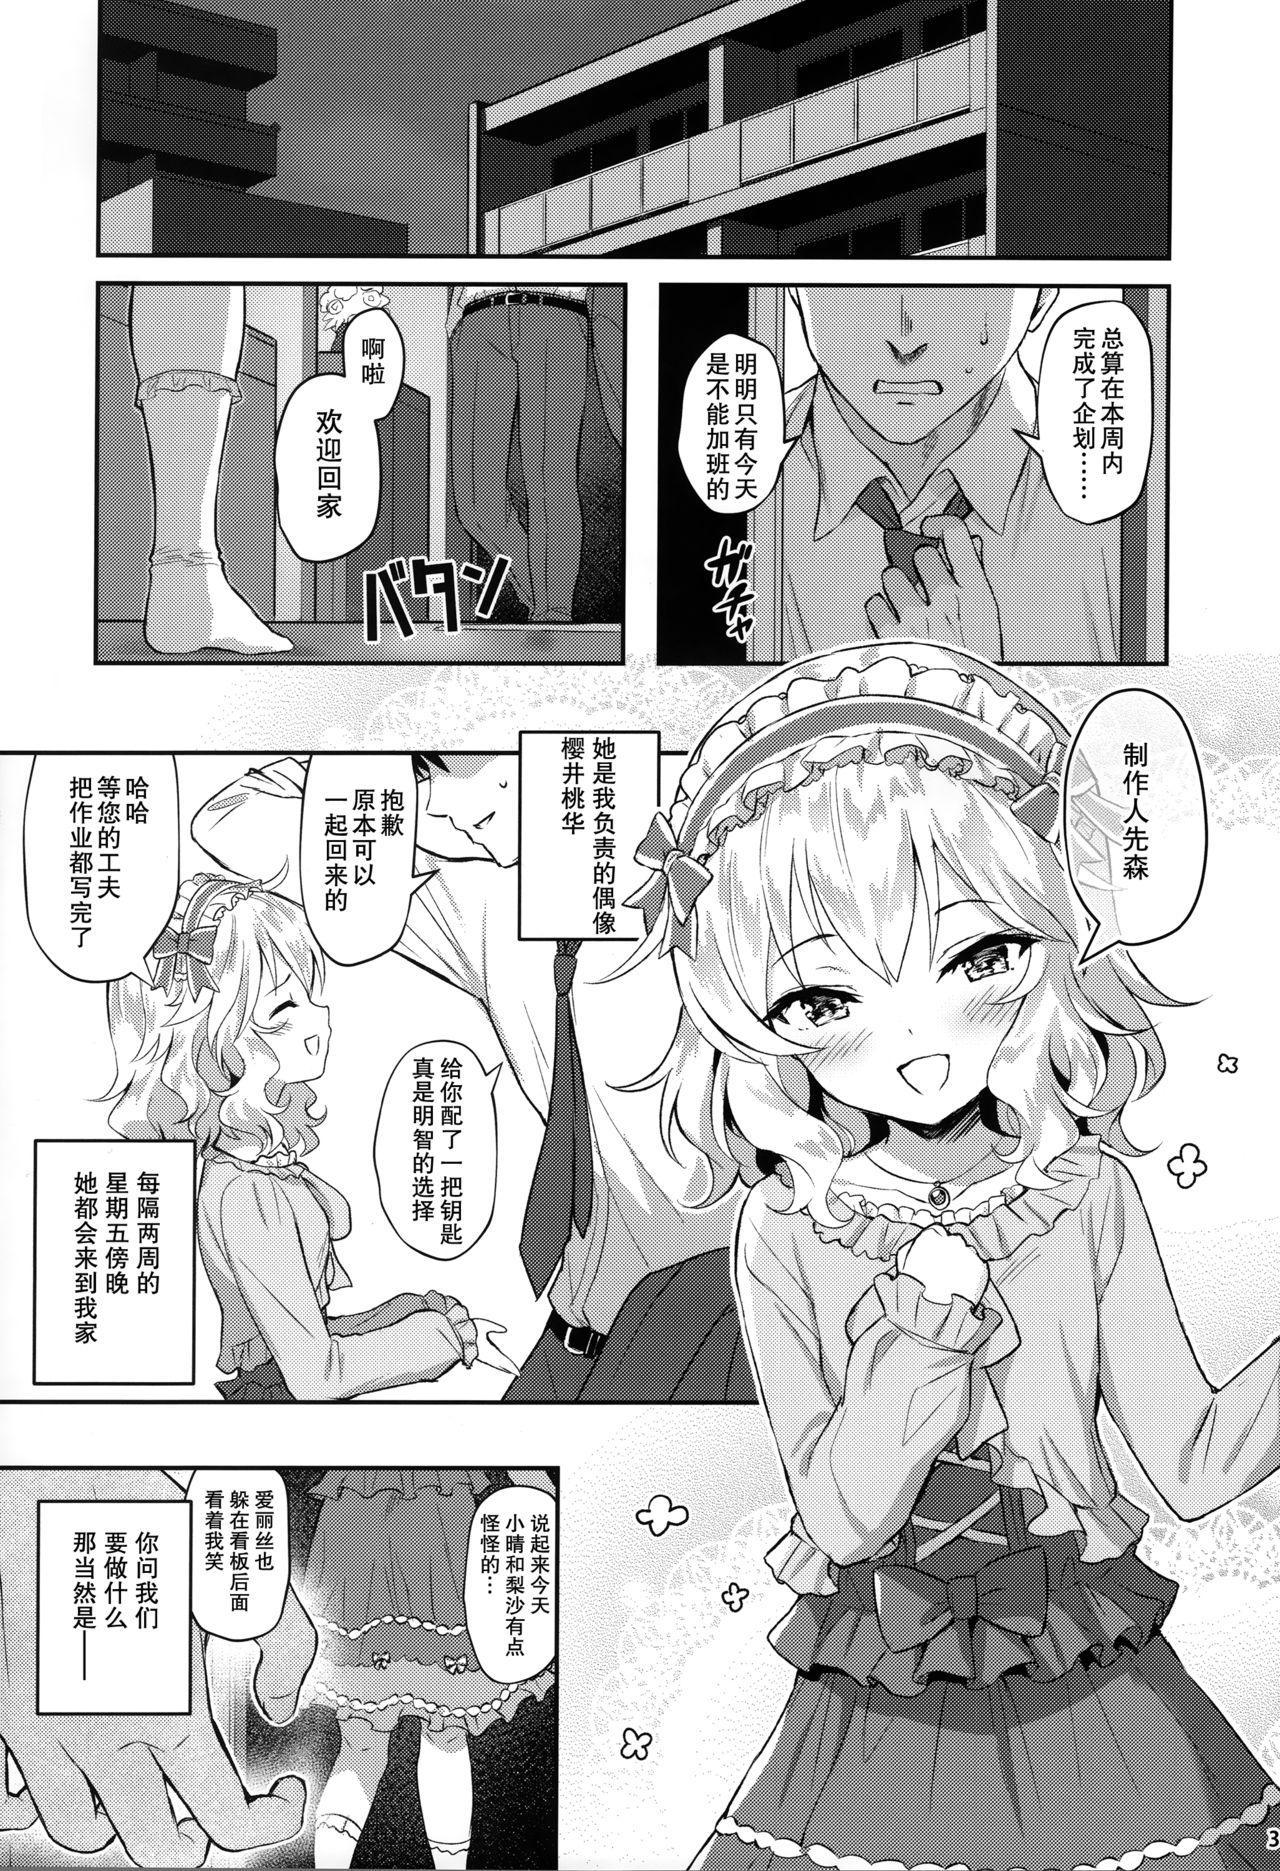 (My Best Friends 12) [Horizontal World (Matanonki) Momoka Yoitsuma (THE IDOLM@STER CINDERELLA GIRLS) [Chinese] [匿名无名+无名抓来的两只动物帮忙汉化] 2